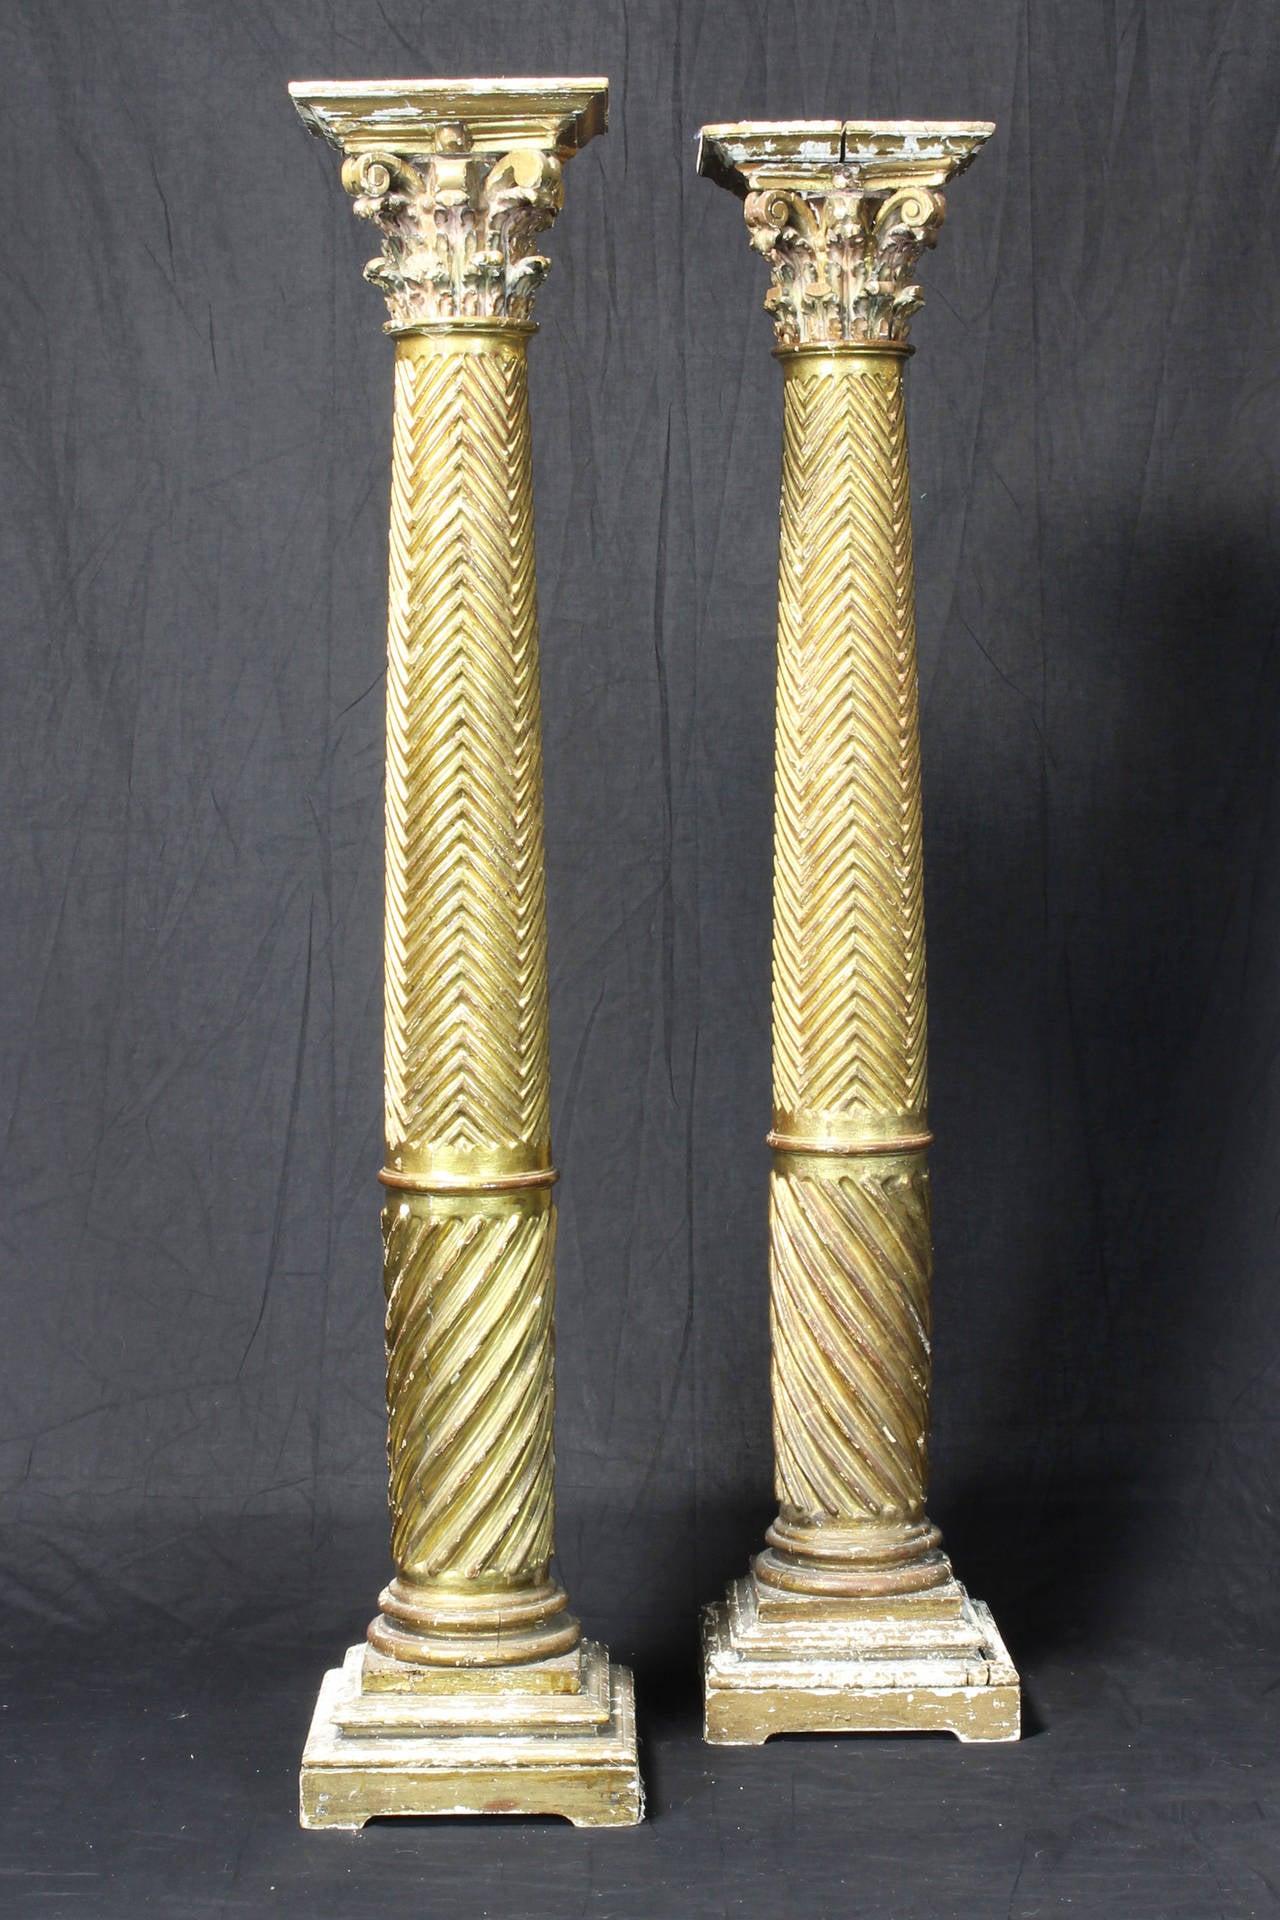 Pair Of 19th Century Italian Neoclassical Gilt Wood